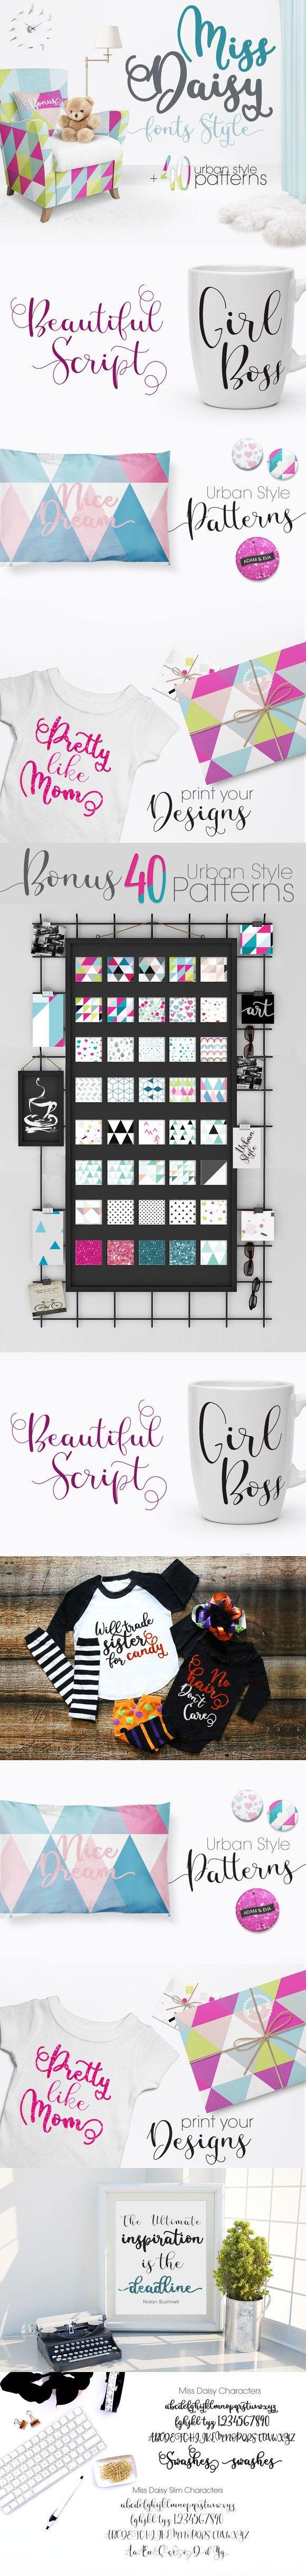 cursive fonts for wedding cards%0A Miss Daisy Fonts Patterns Freebies  Script Fonts